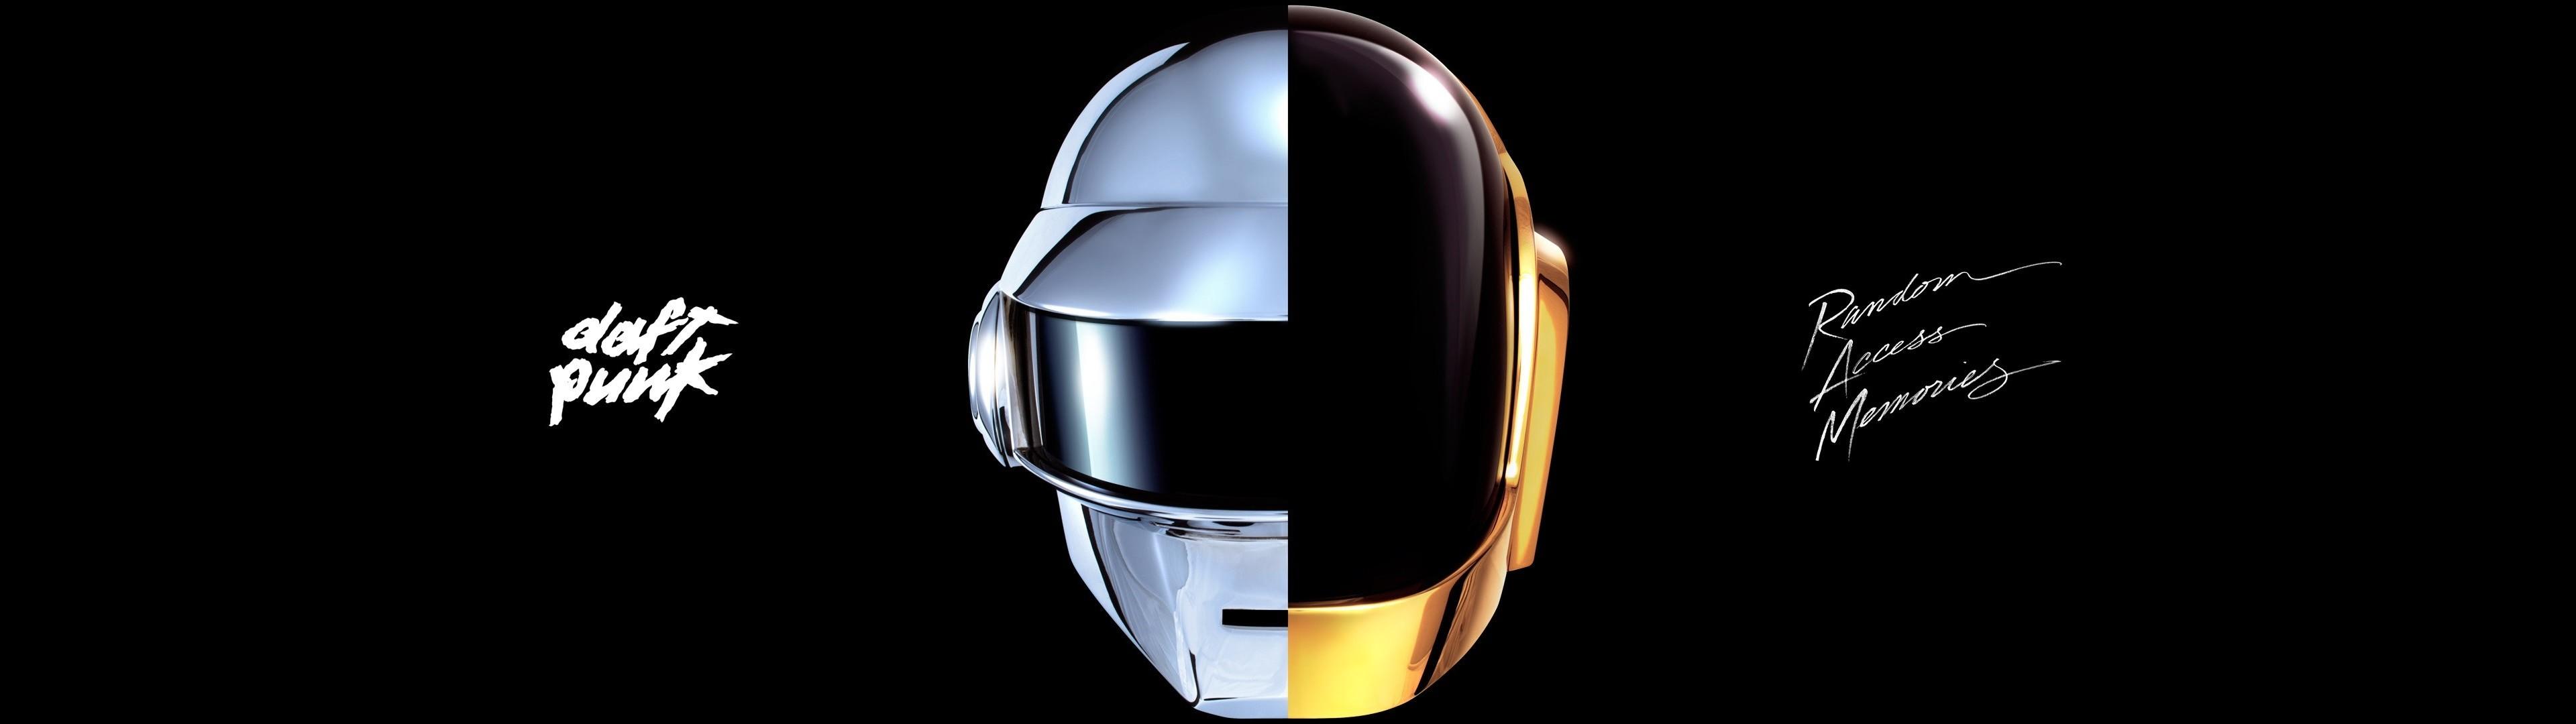 Daft Punk (dual monitor) [3840×1080] (xpost /r/wallpapers) …